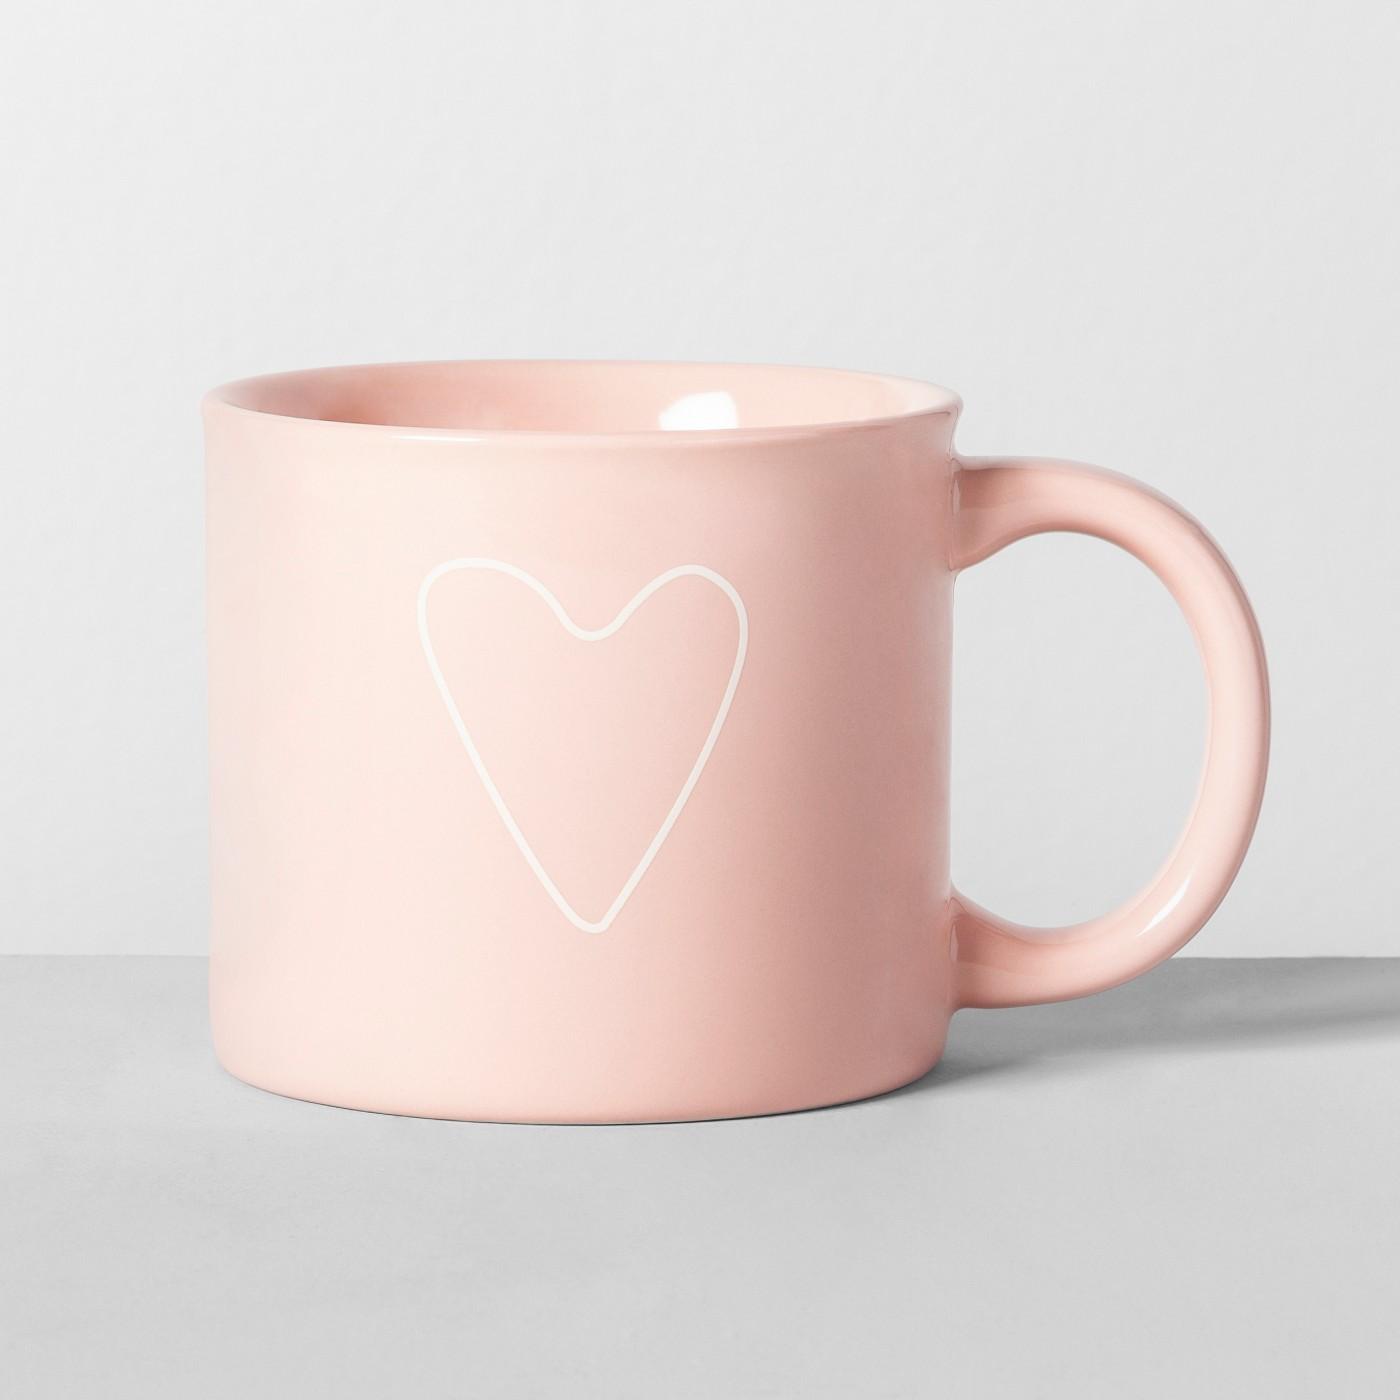 16oz Porcelain Heart Mug Pink - Opalhouse™ - image 1 of 1